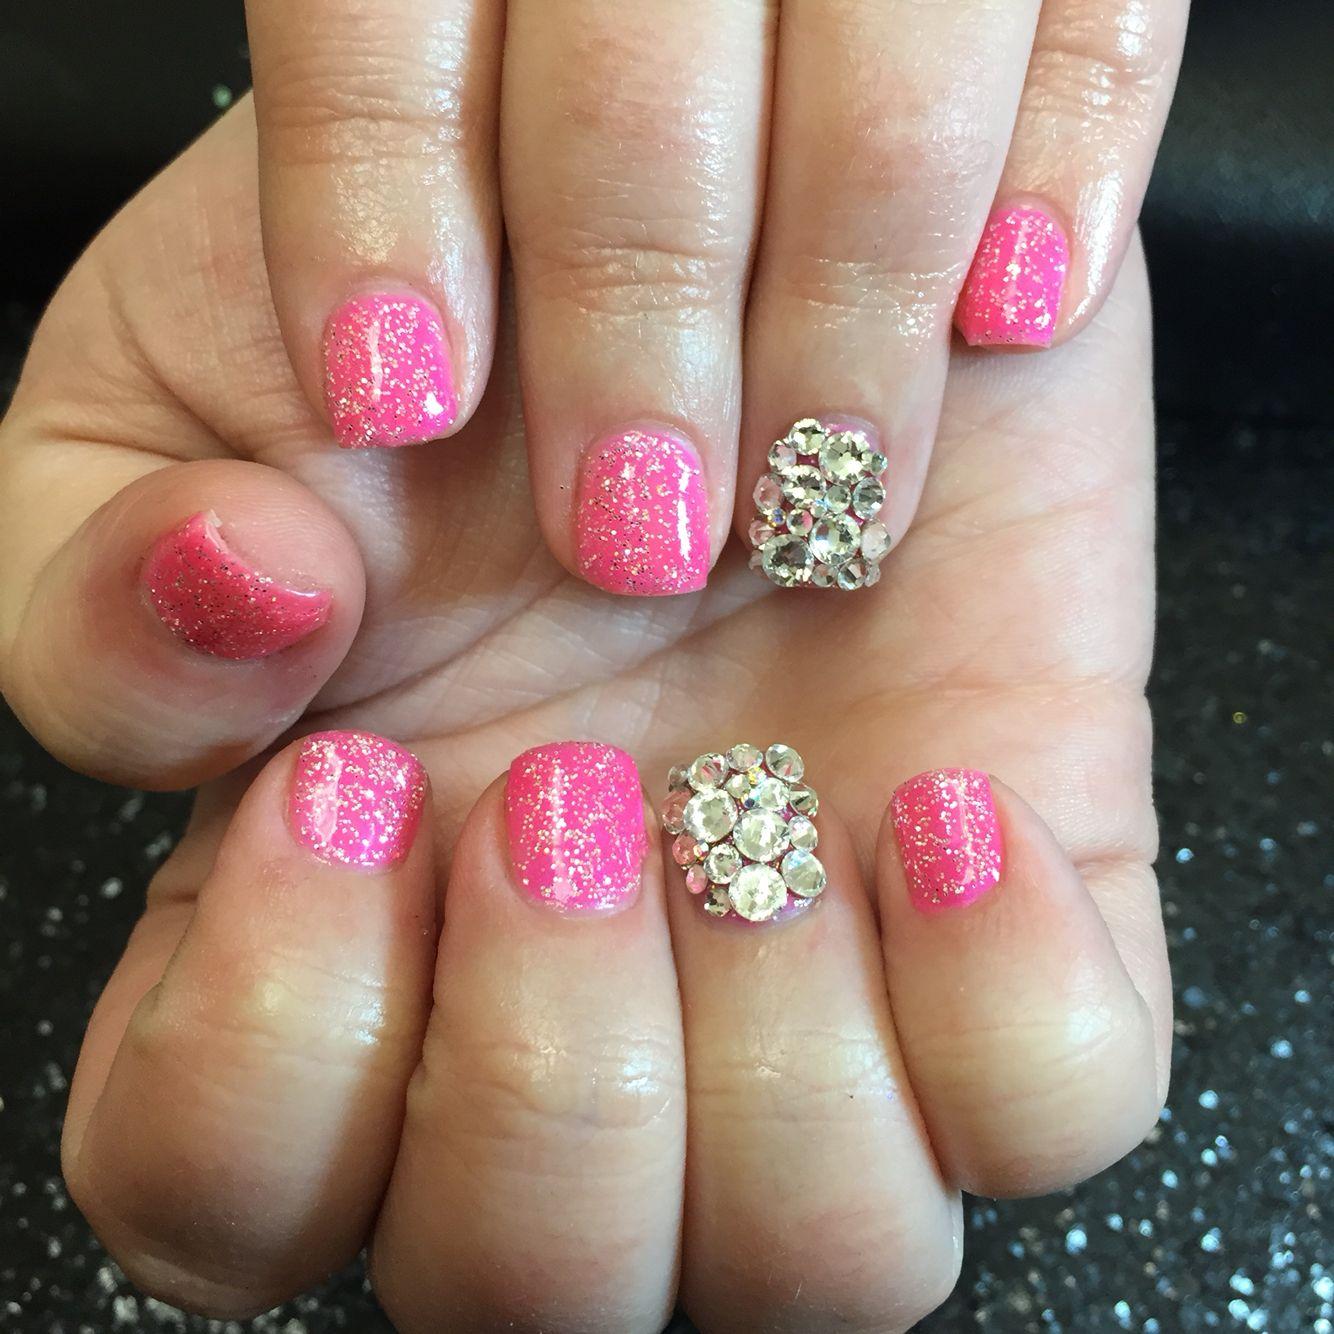 Barbie Nails Hellokaylaranaenails Hkrn Nailenthusiast Genuineswarovski Lasvegasnails Lvnails Dopenailso Cute Nails Las Vegas Nails Young Nails